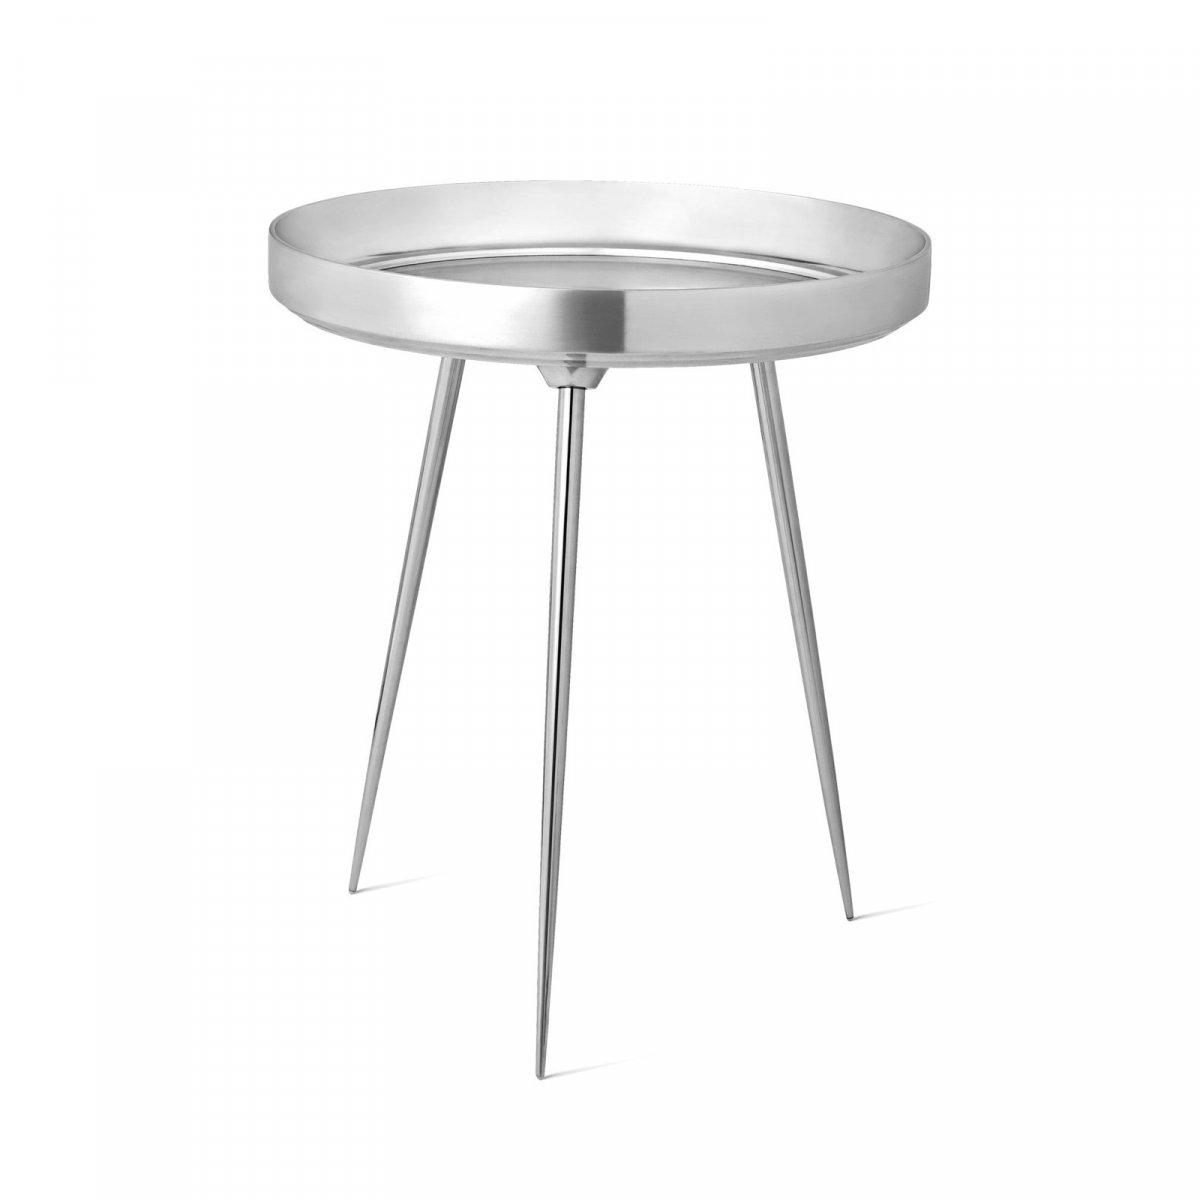 Alu Bowl Table, polished.